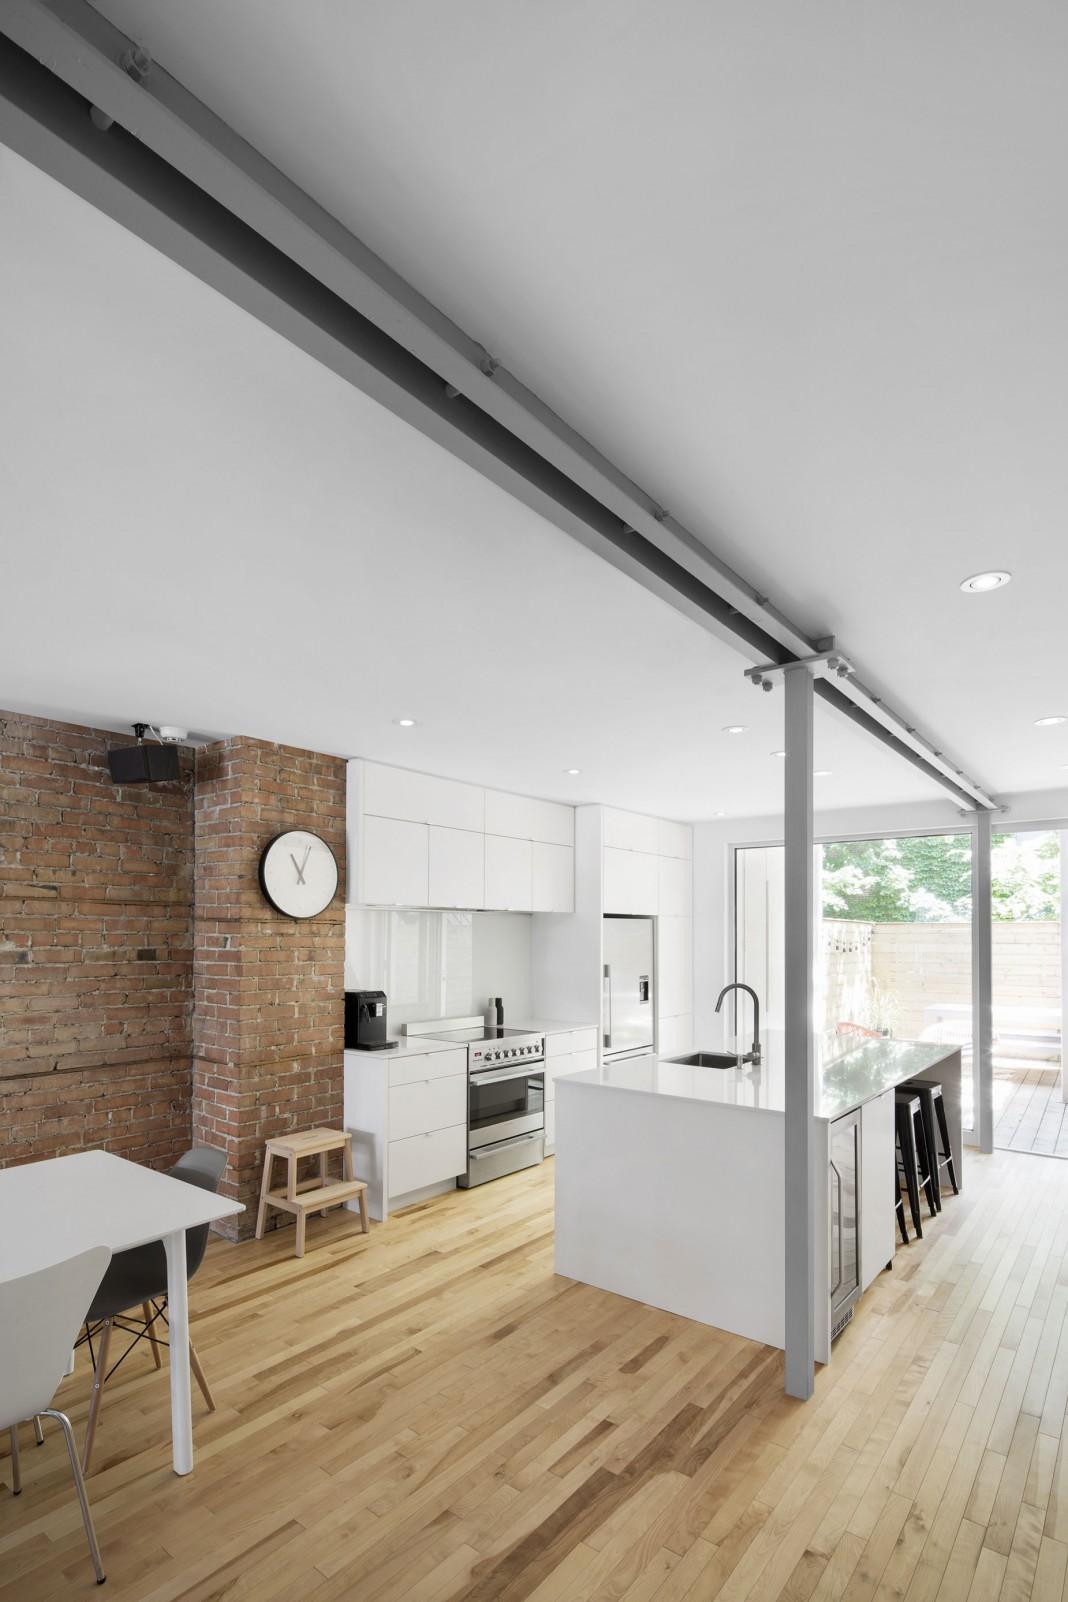 867 De Bougainville Apartment by Bourgeois/Lechasseur architects